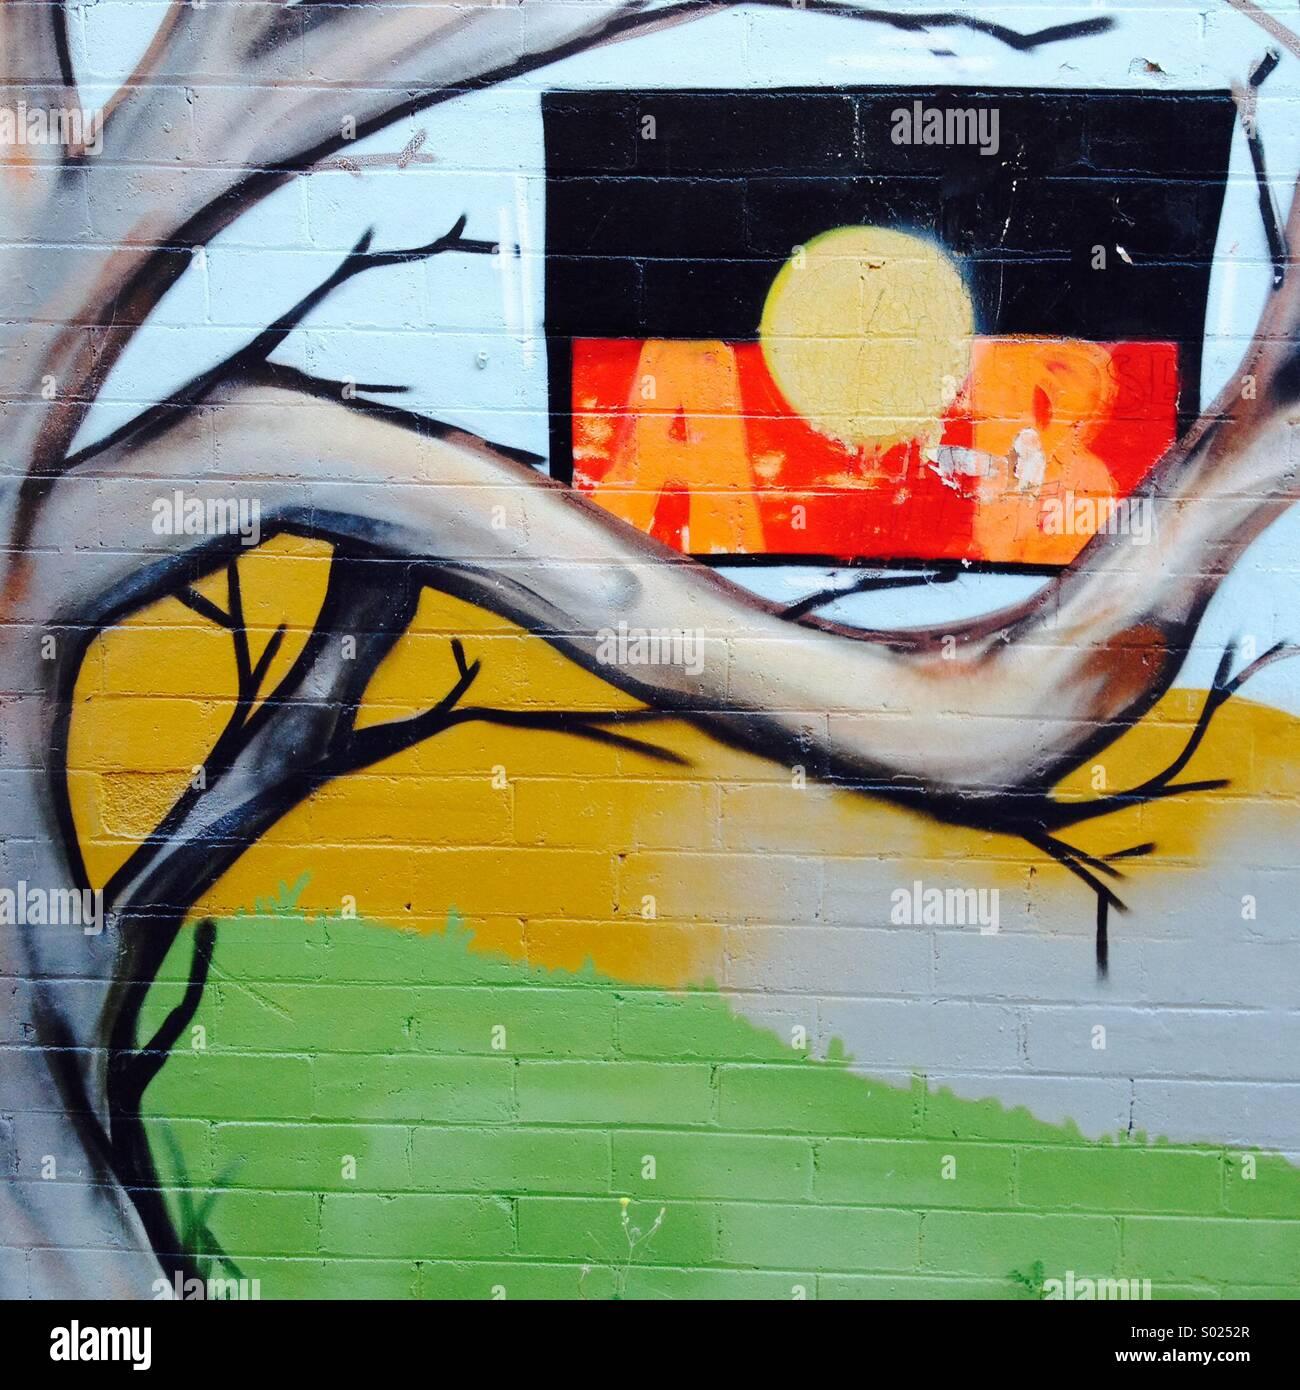 Street art featuring the Aboriginal flag in a tree, Lismore, NSW, Australia - Stock Image